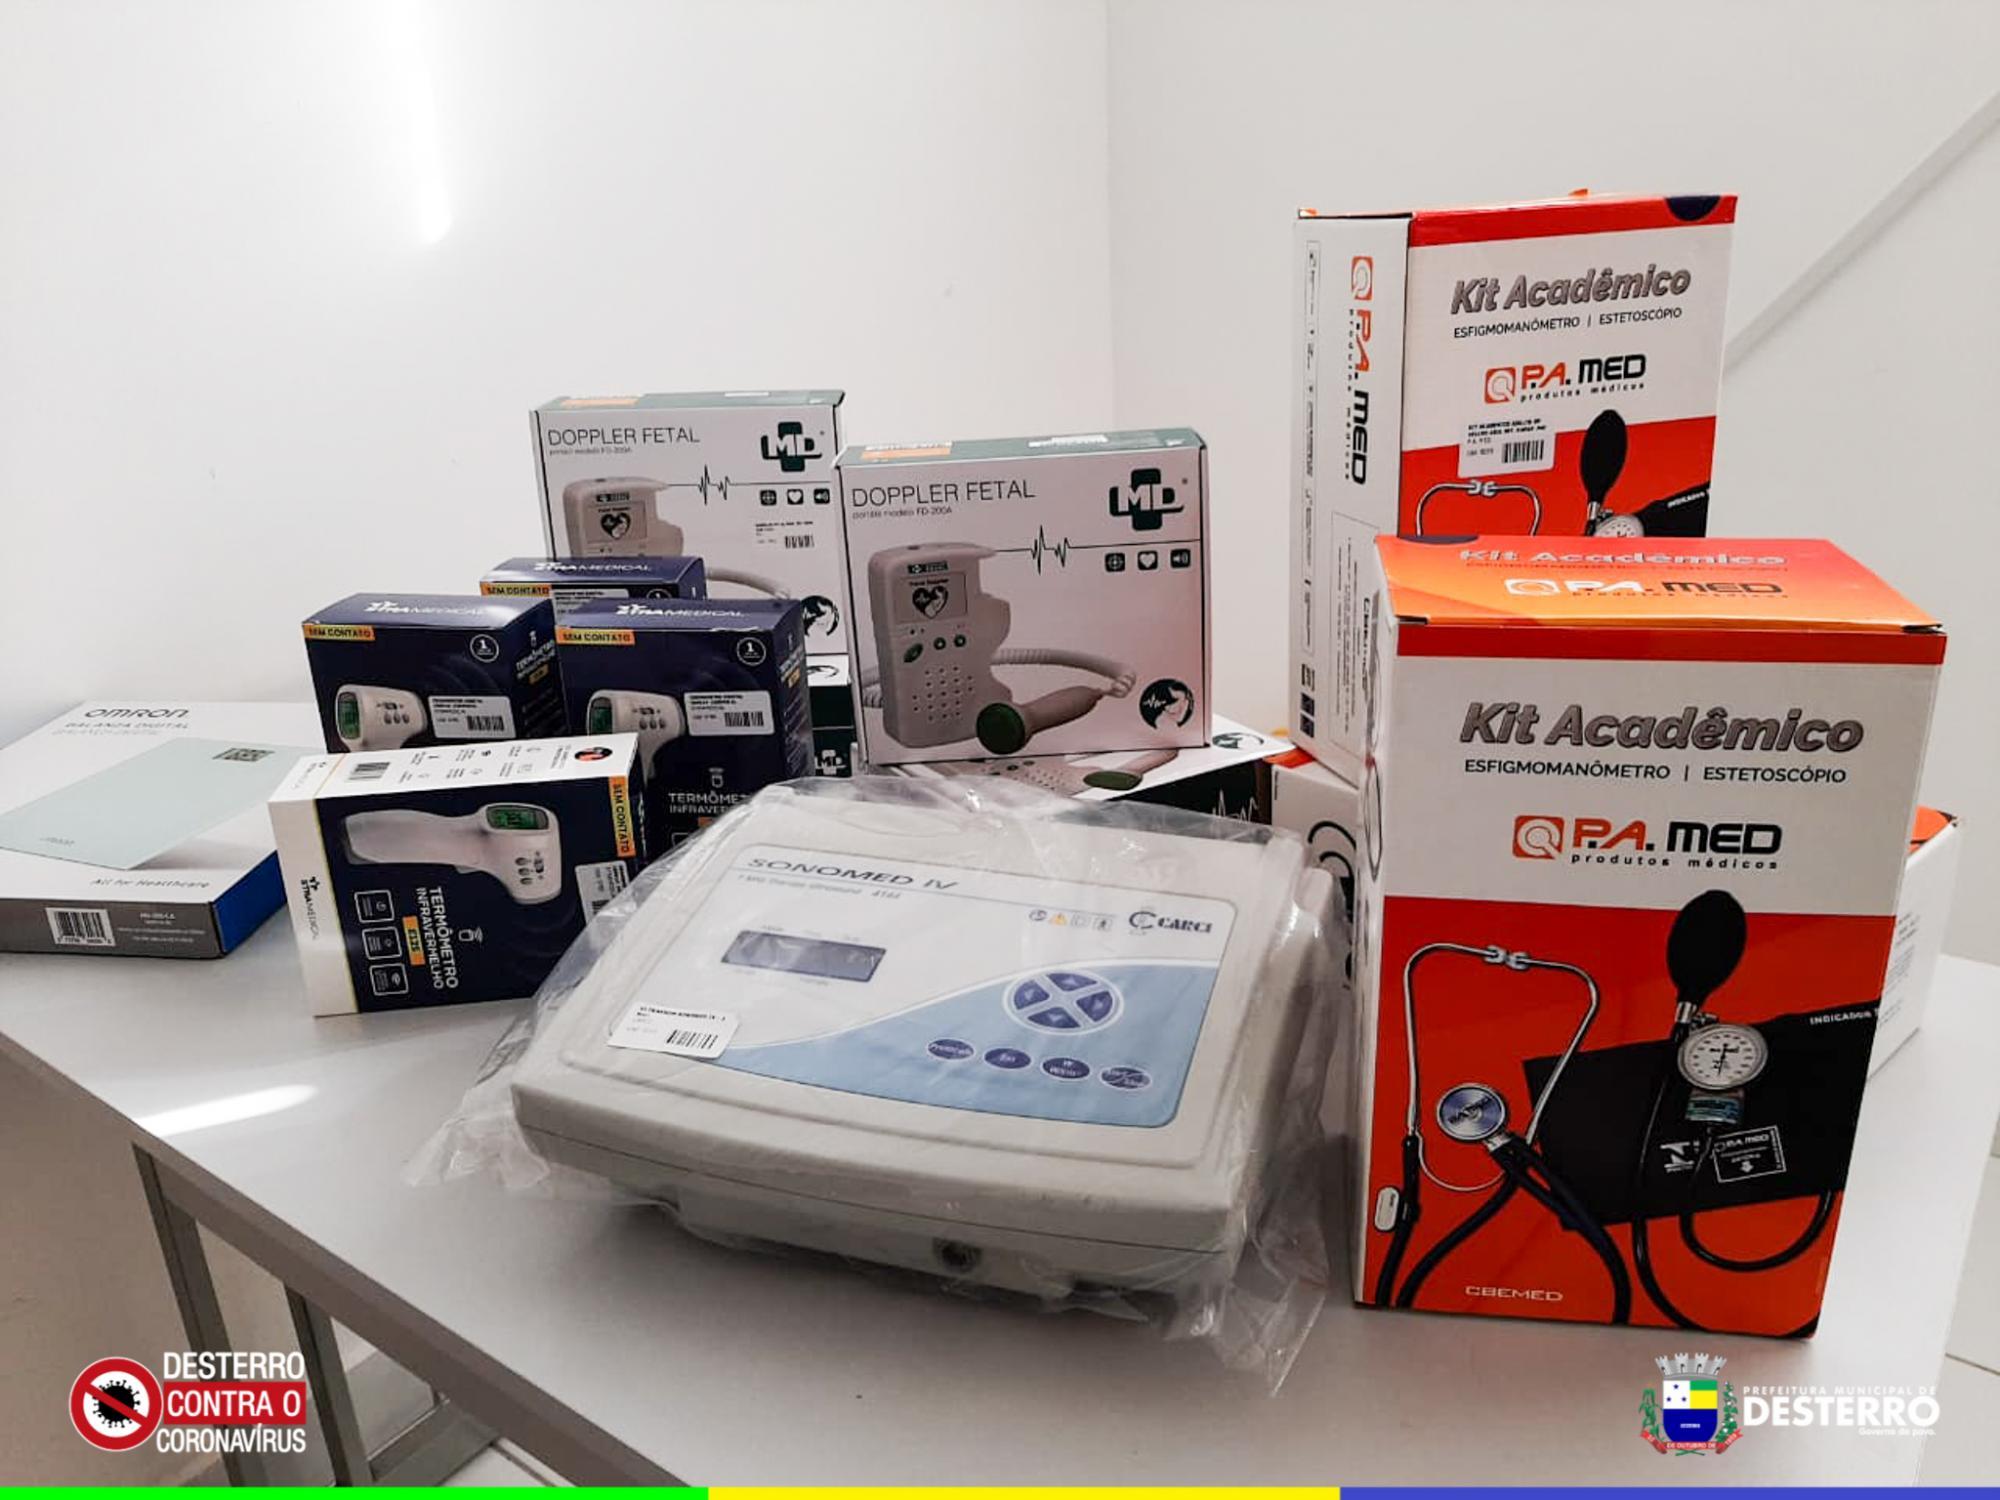 Prefeitura municipal de Desterro adquire novos equipamentos para as UBS'S...